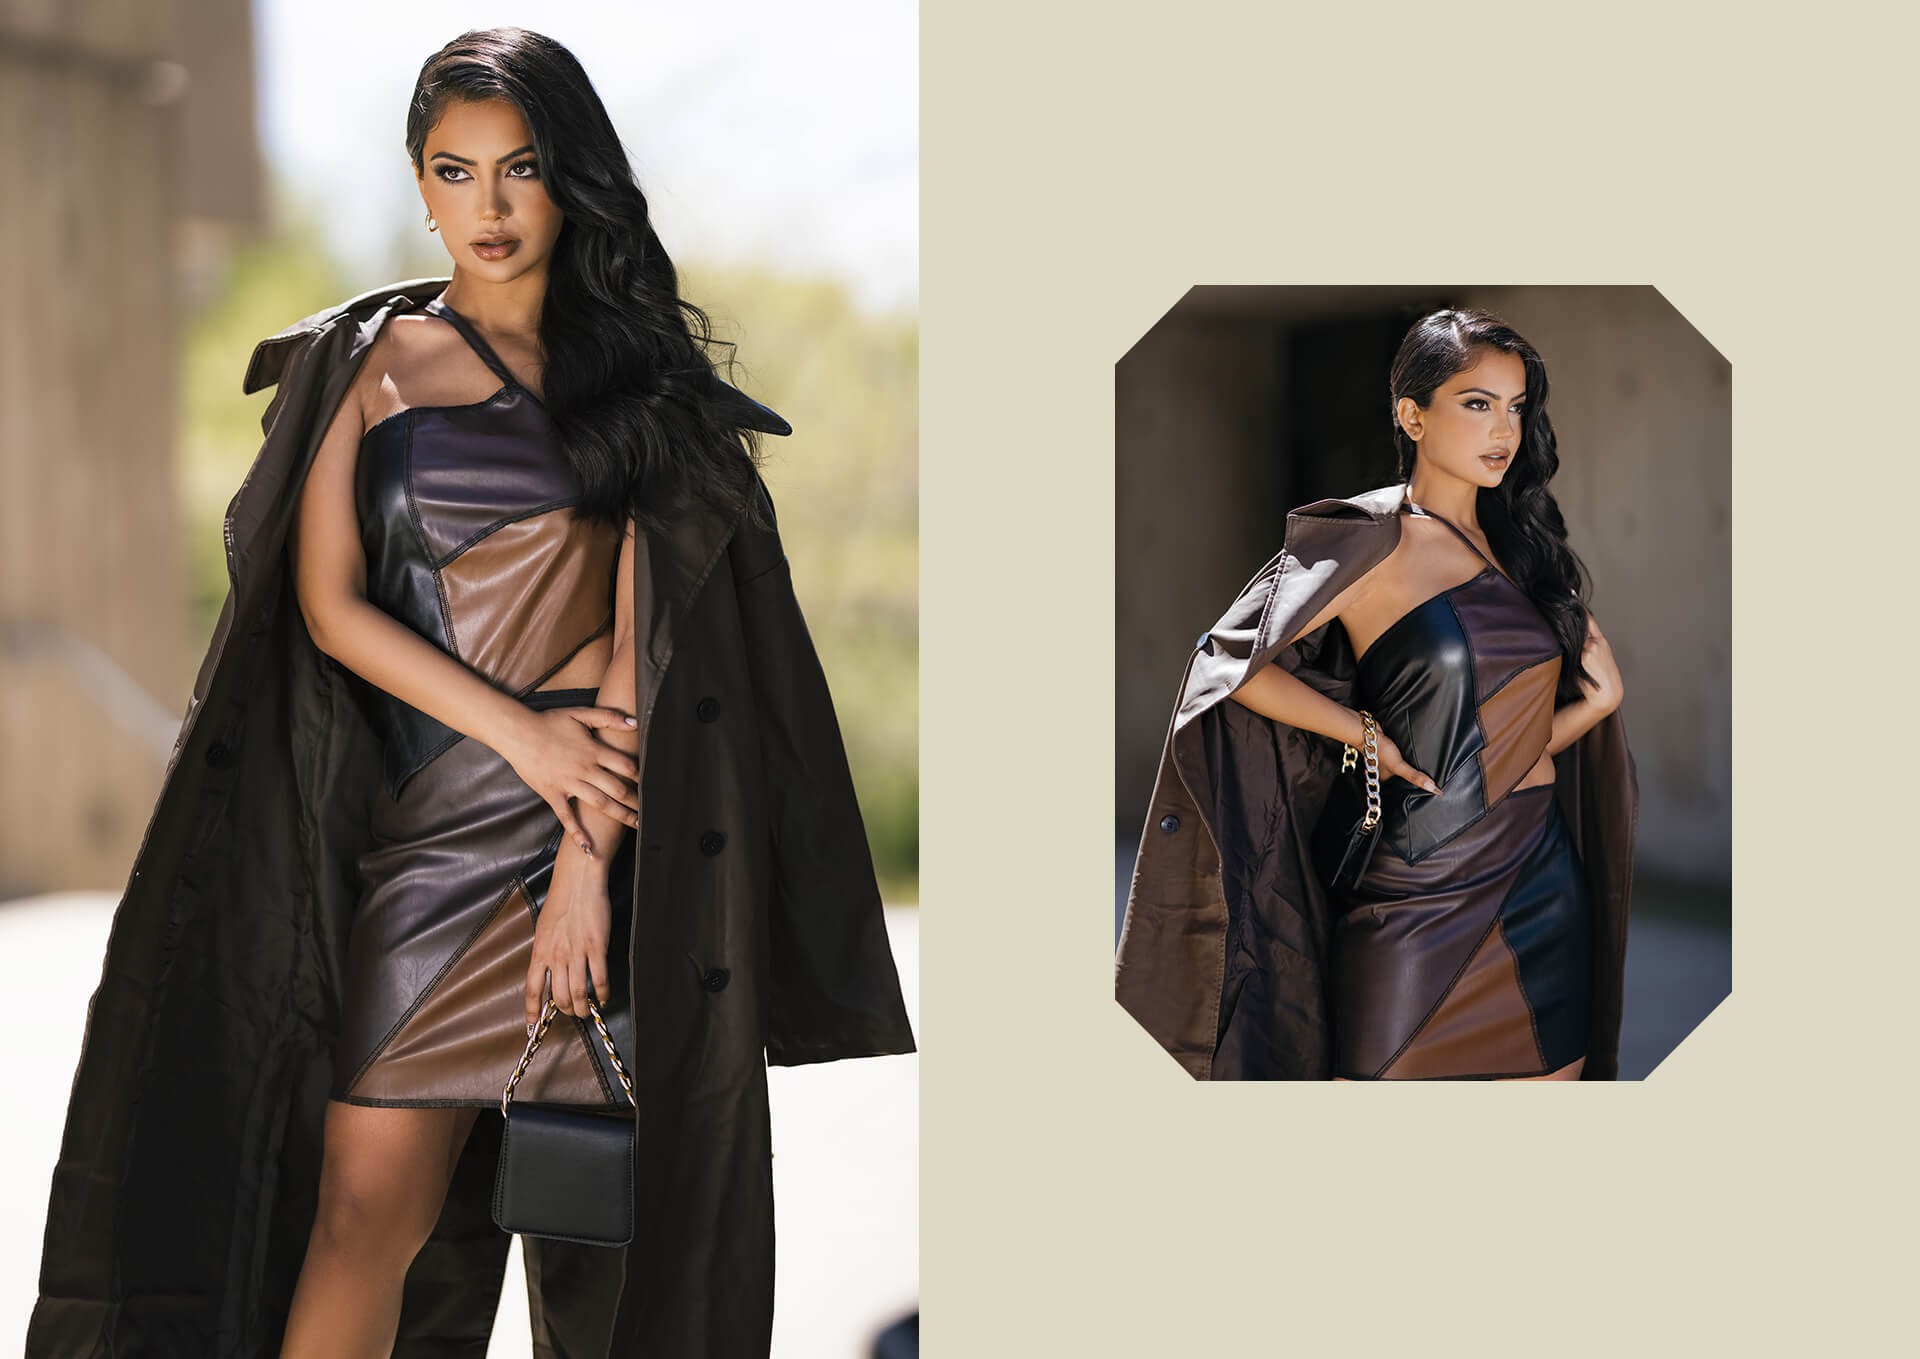 Aneeqa Farid Lookbook Image Desktop 7